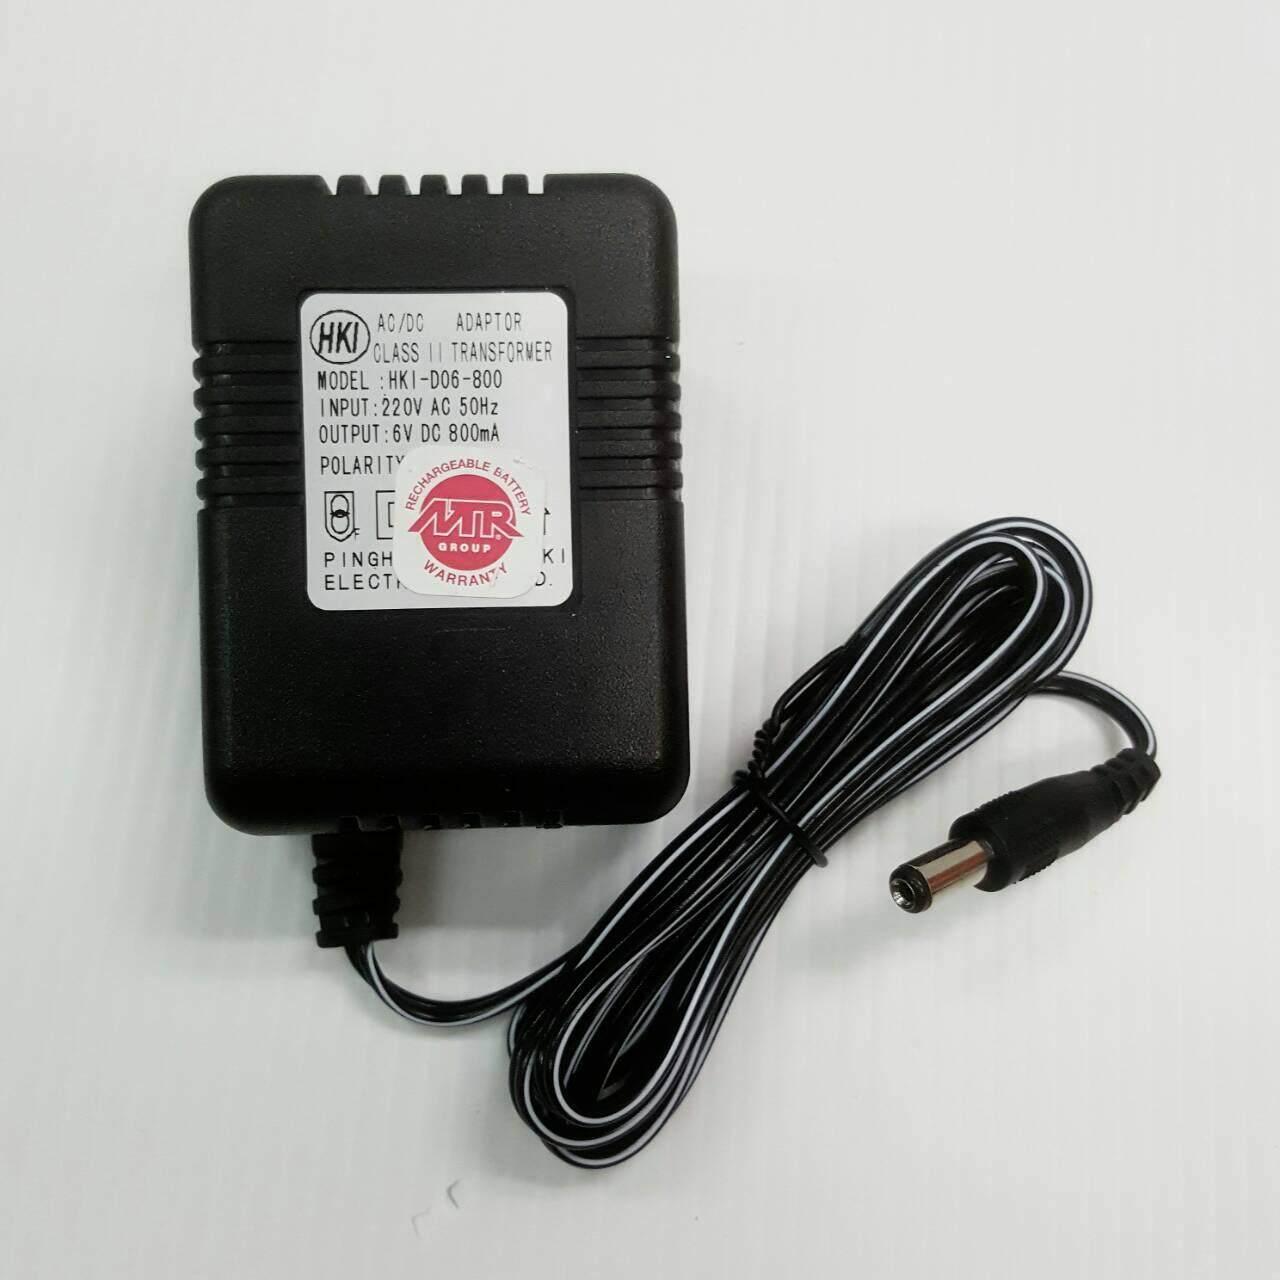 power charger for children battery car 6v หม้อชาร์จรถแบตเตอรี่ ที่ชาร์จรถเด็กแบตเตอรี่ 6v.